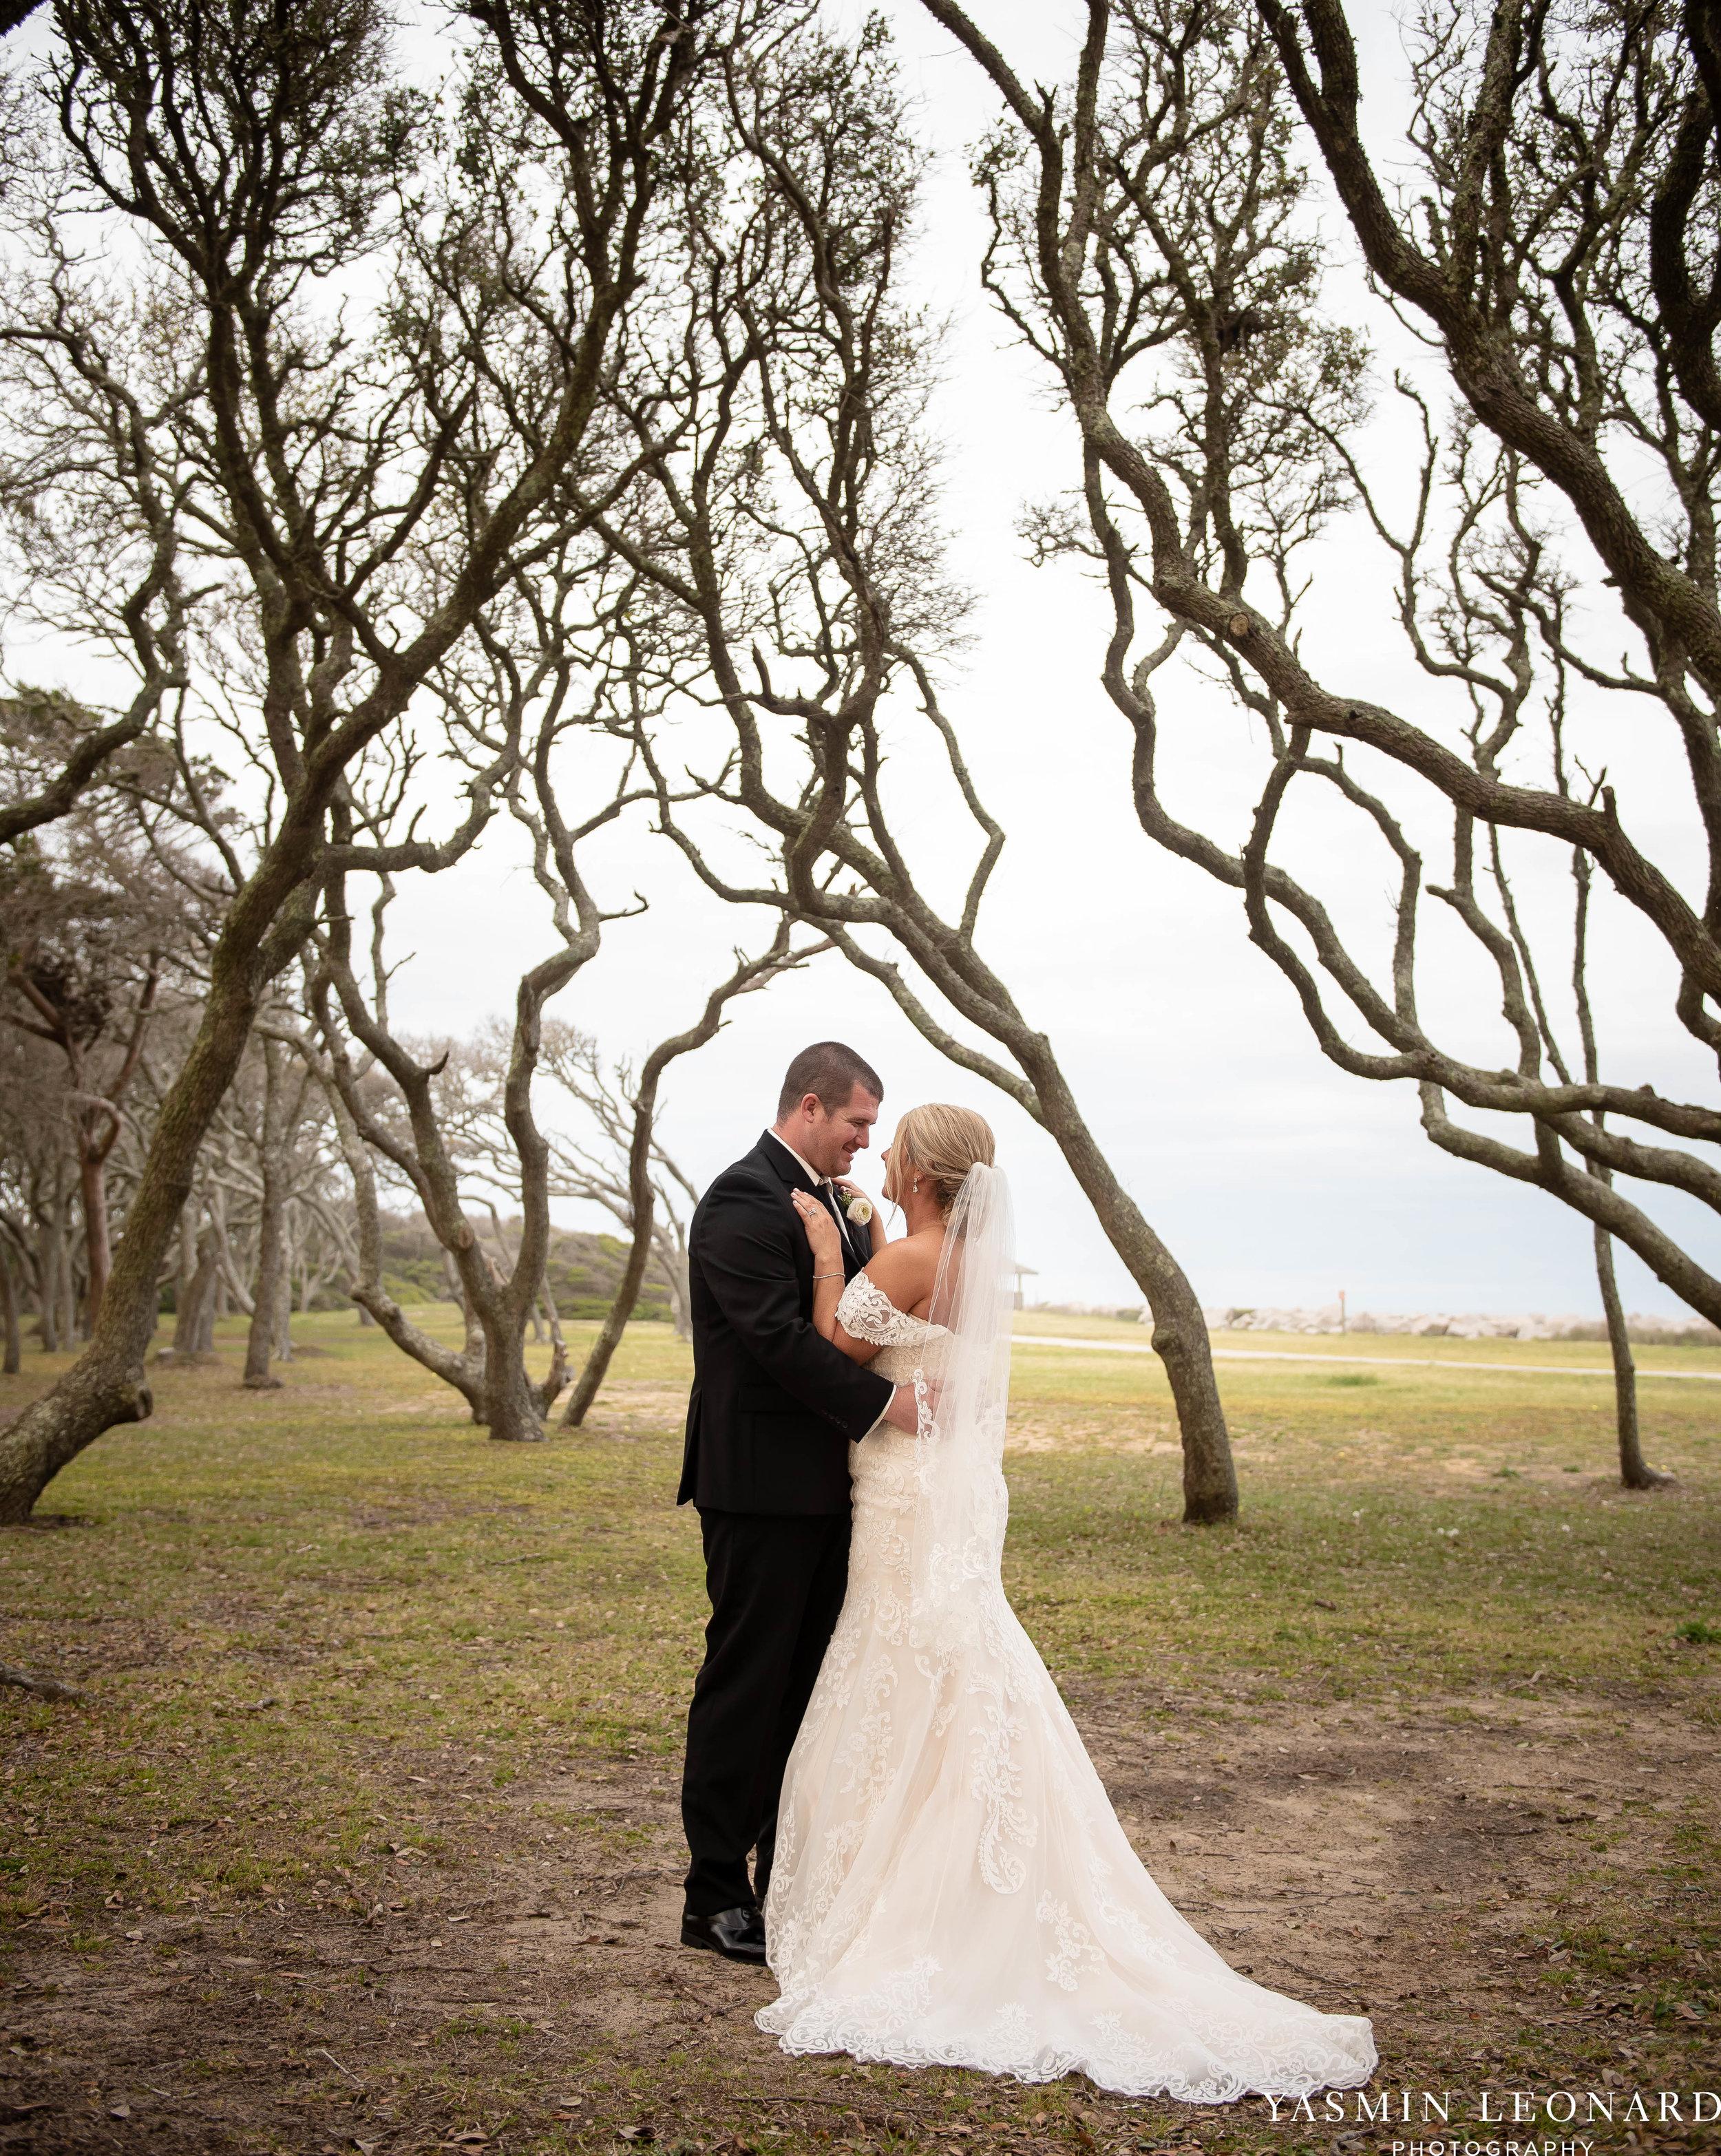 Carolina Beach Wedding - Fort Fisher Wedding - NC Acquarium - Beach Wedding - NC Wedding - Beach Wedding Inspiration - Beach Bride-34.jpg